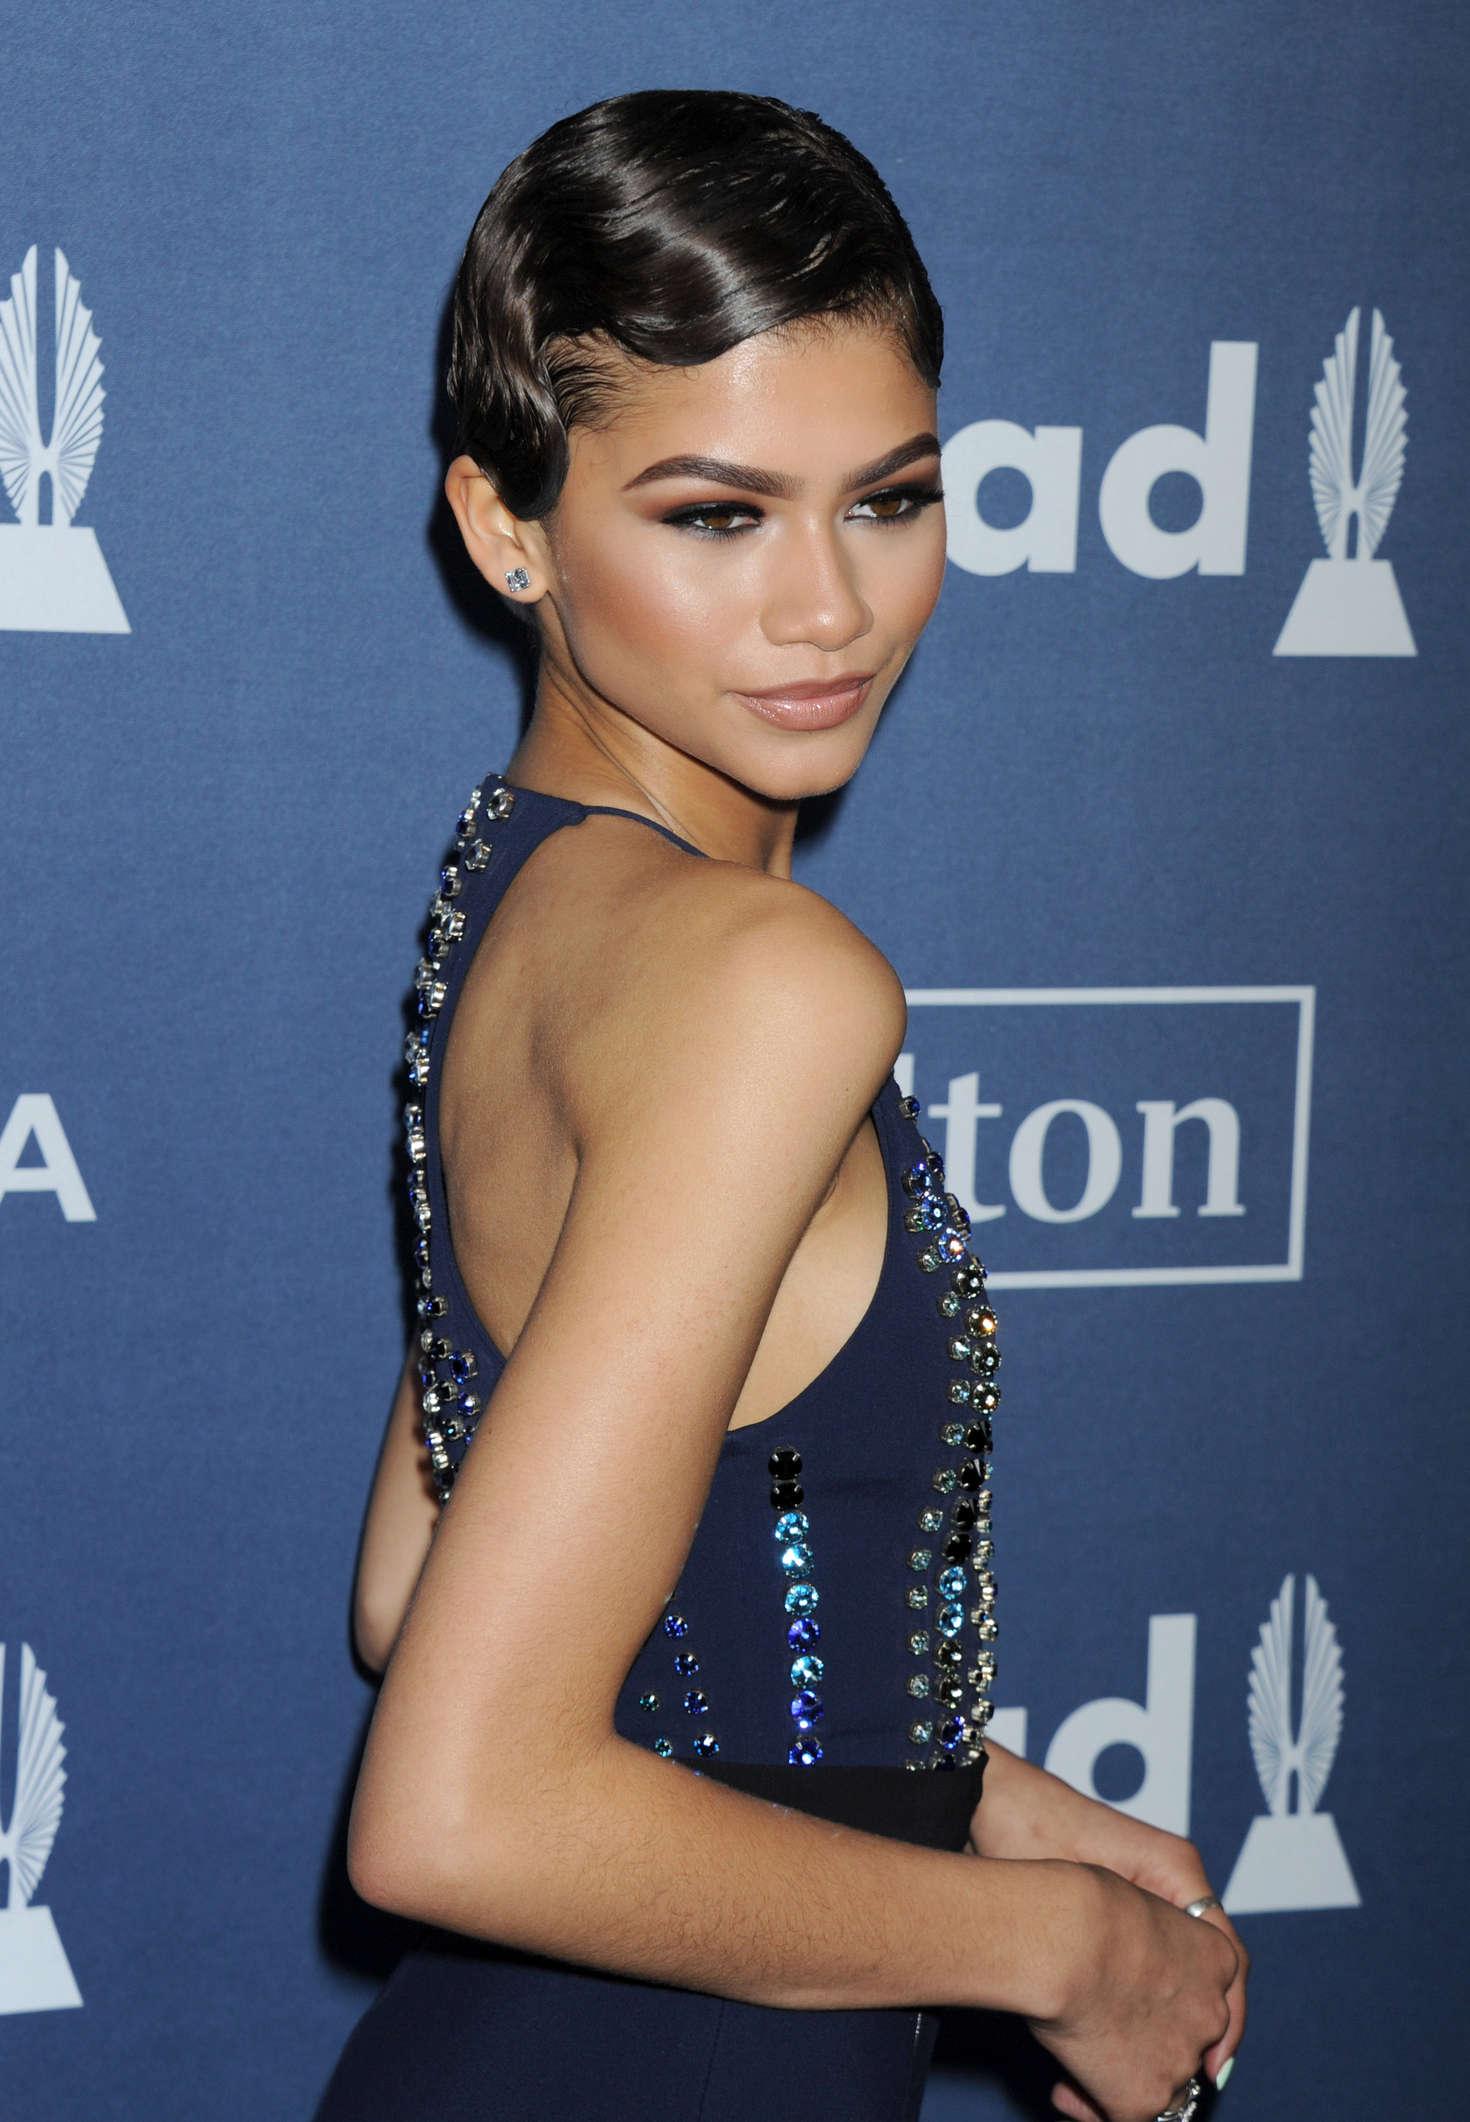 Zendaya - GLAAD Media Awards 2016 in Beverly Hills